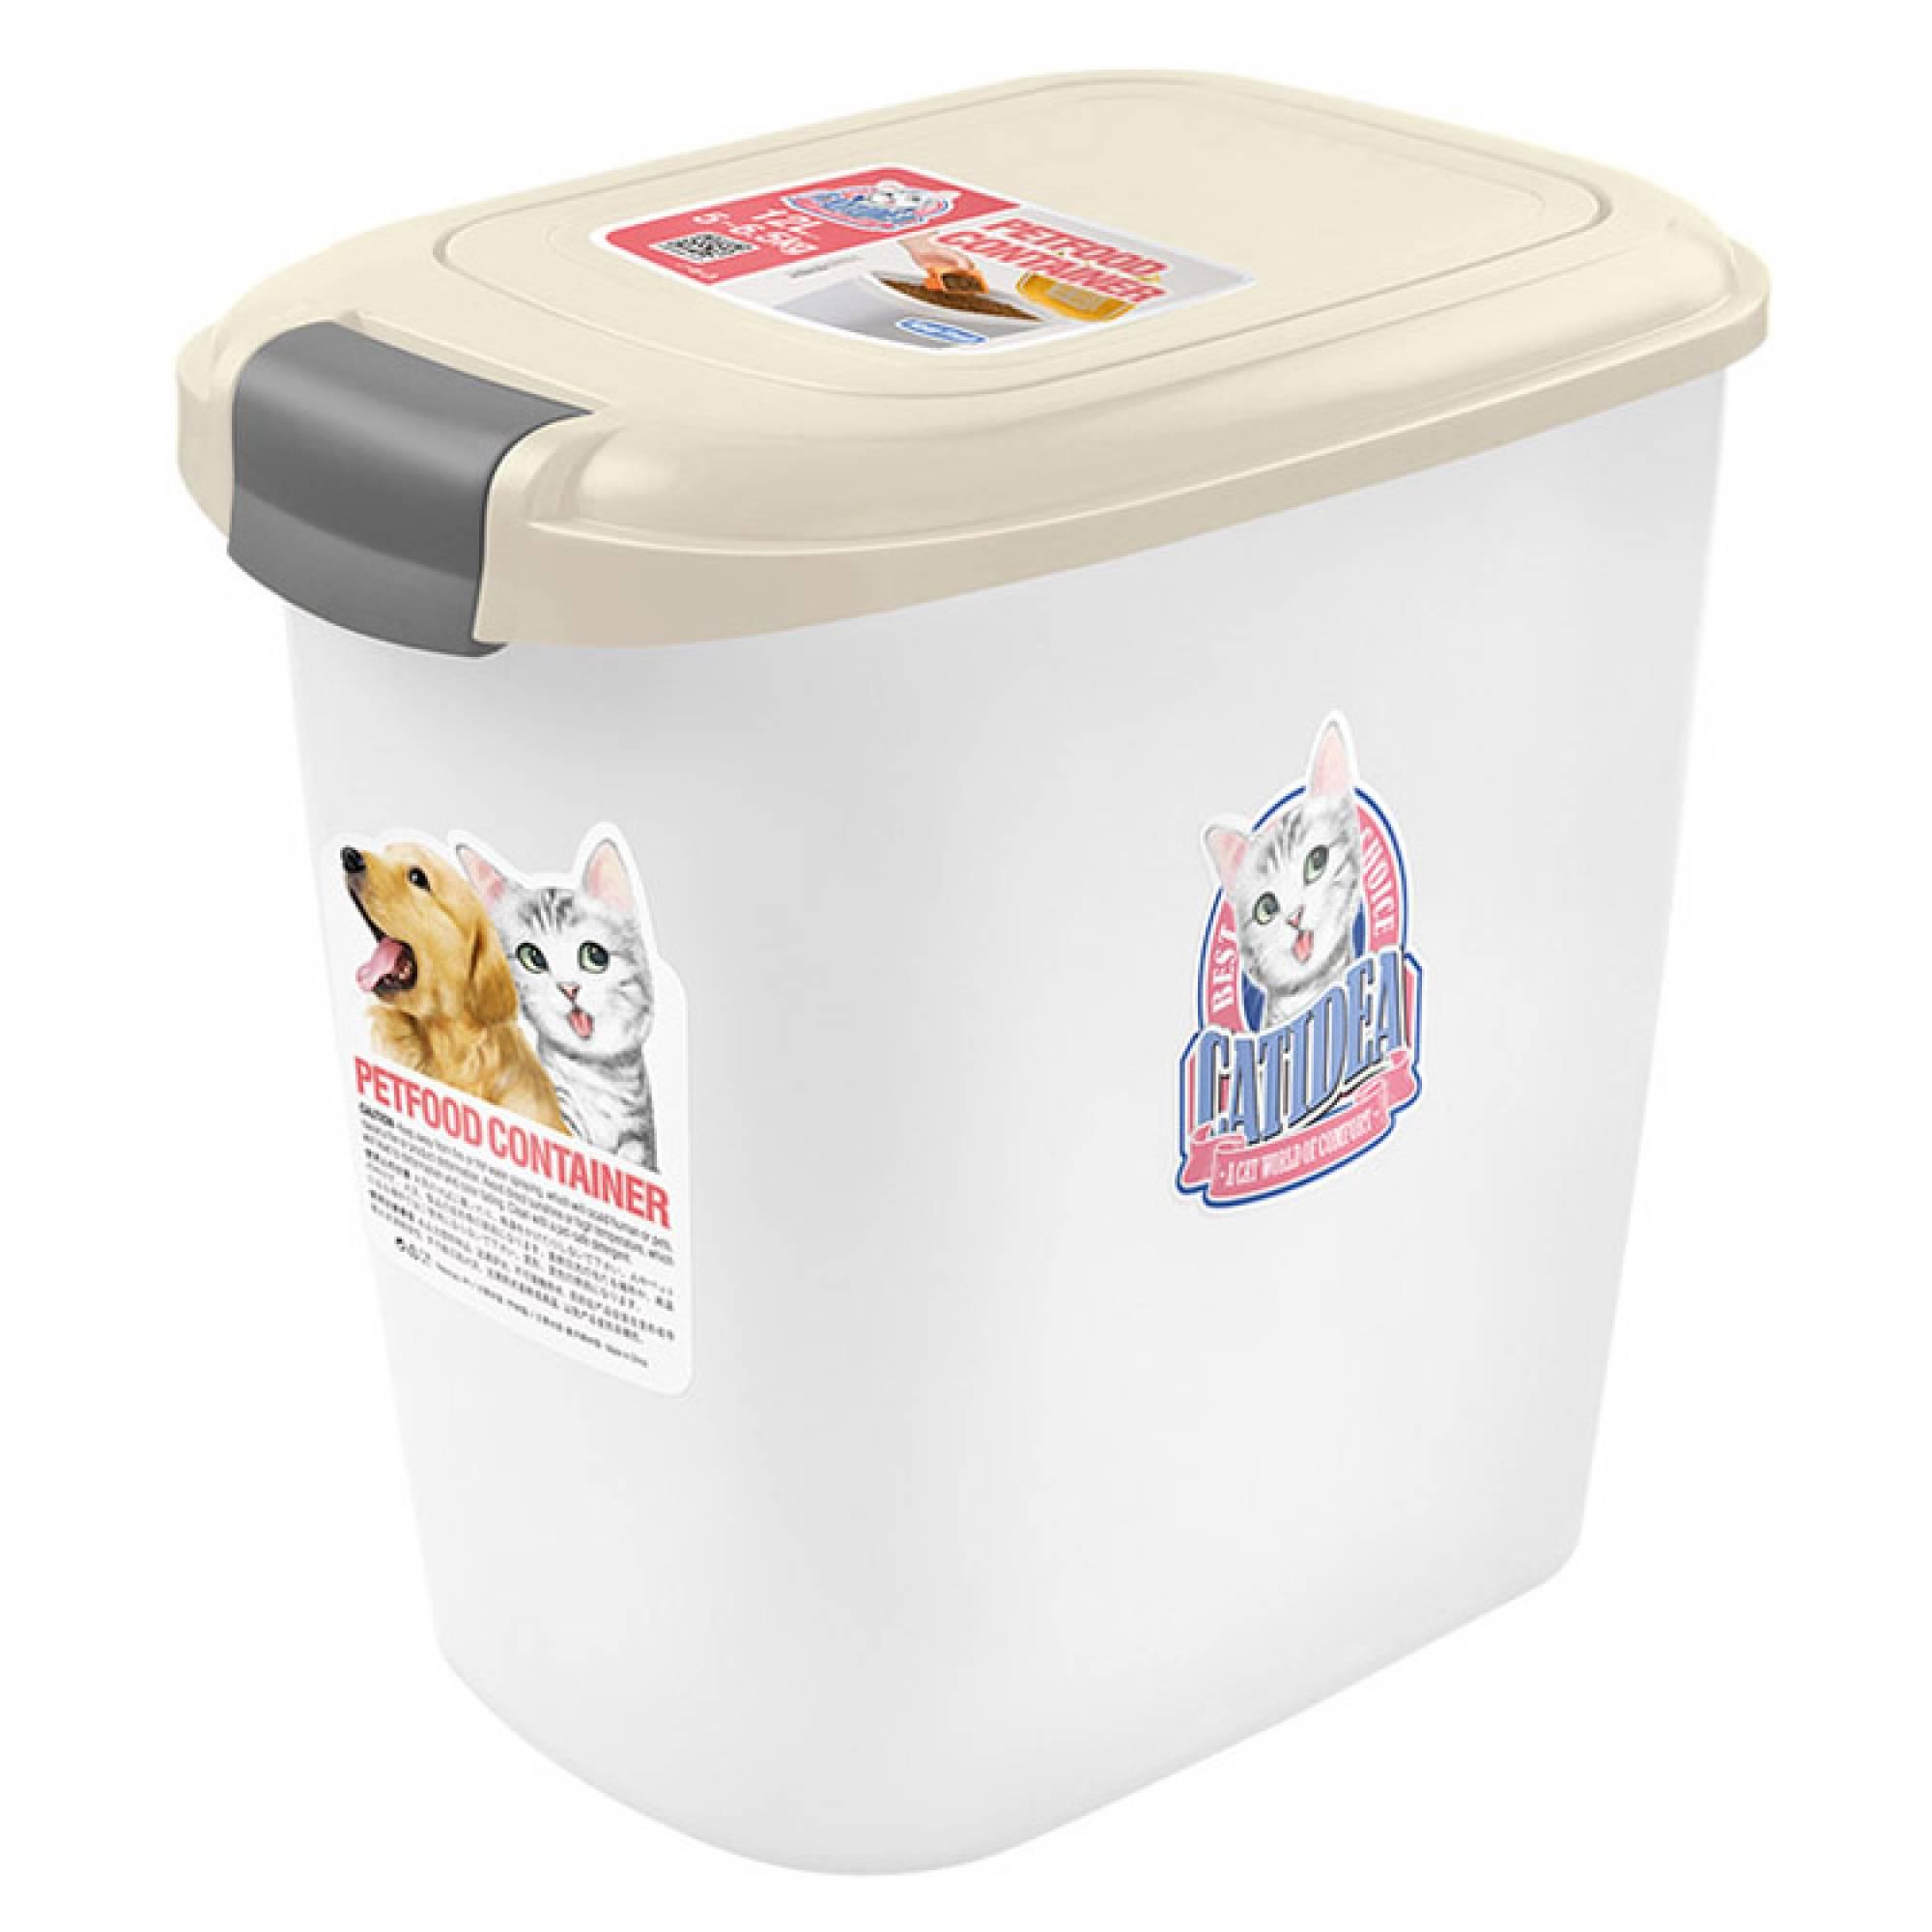 CATIDEA - CF101 Single Open Food Container - 15kg Cream